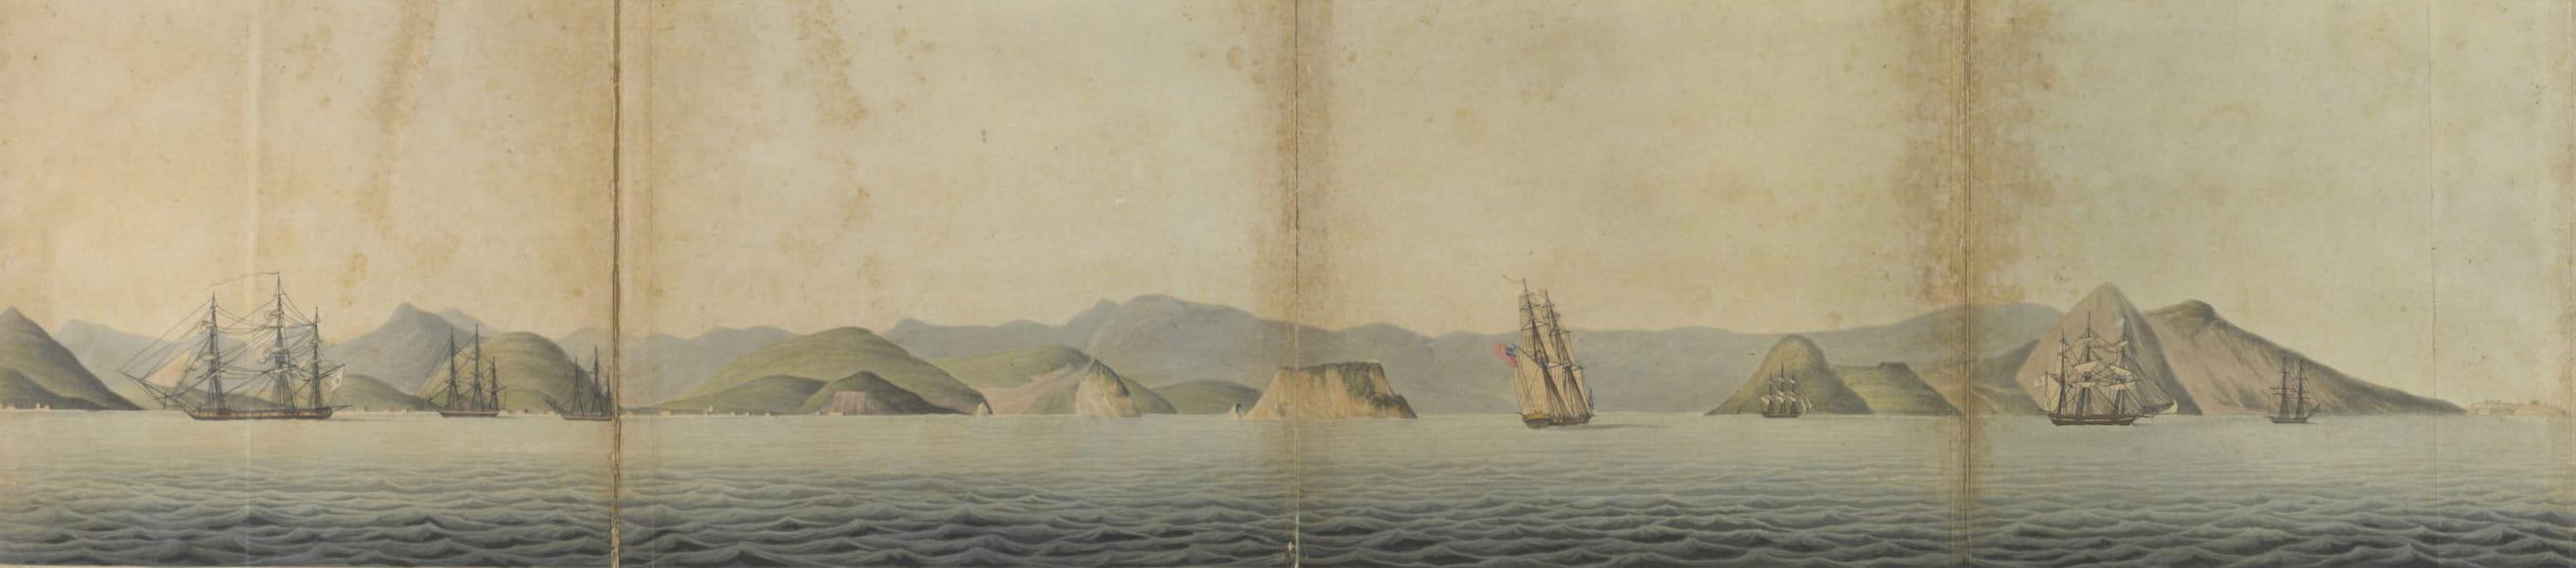 Views and Costumes of the City and Neighbourhood of Rio de Janeiro - Eastern Side of the Harbour of Rio de Janeiro (1822)